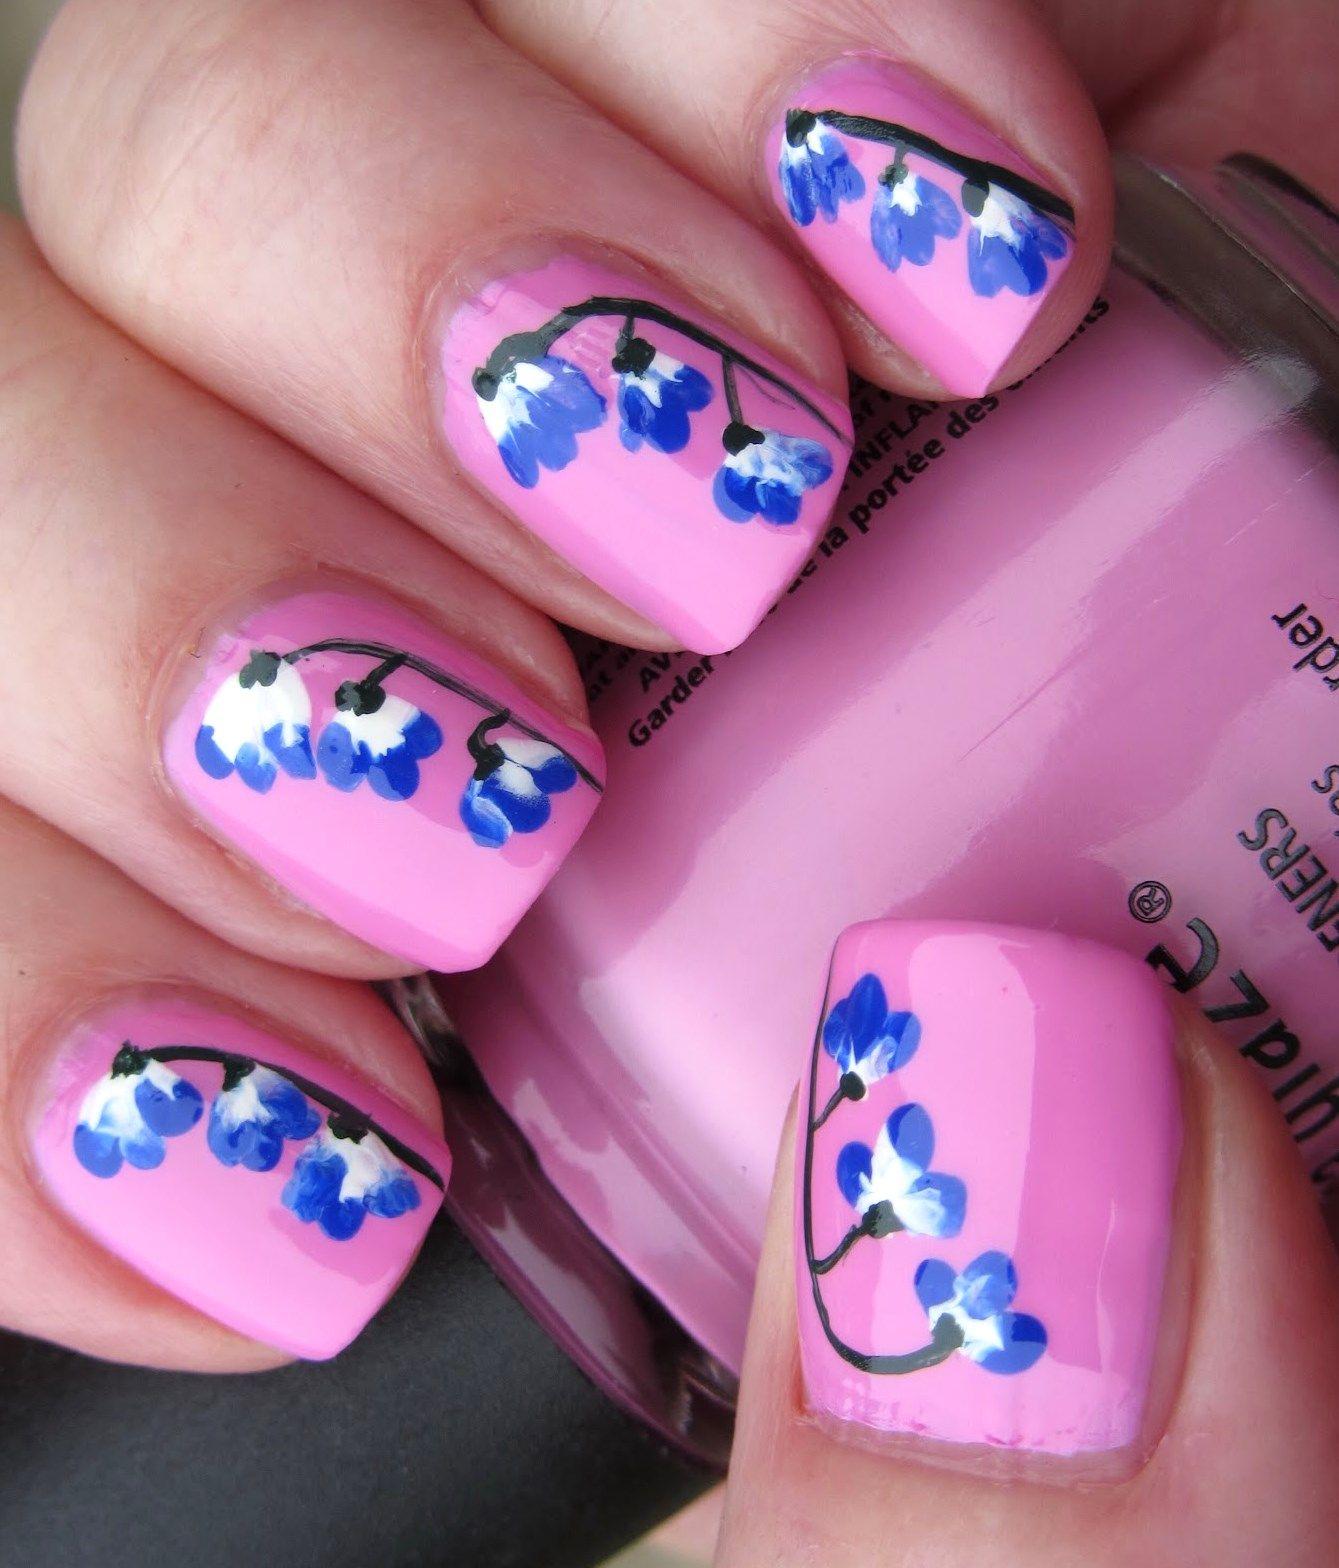 Stunning Nail Art Flowers | Nail Designs | Pinterest | Nail art ...